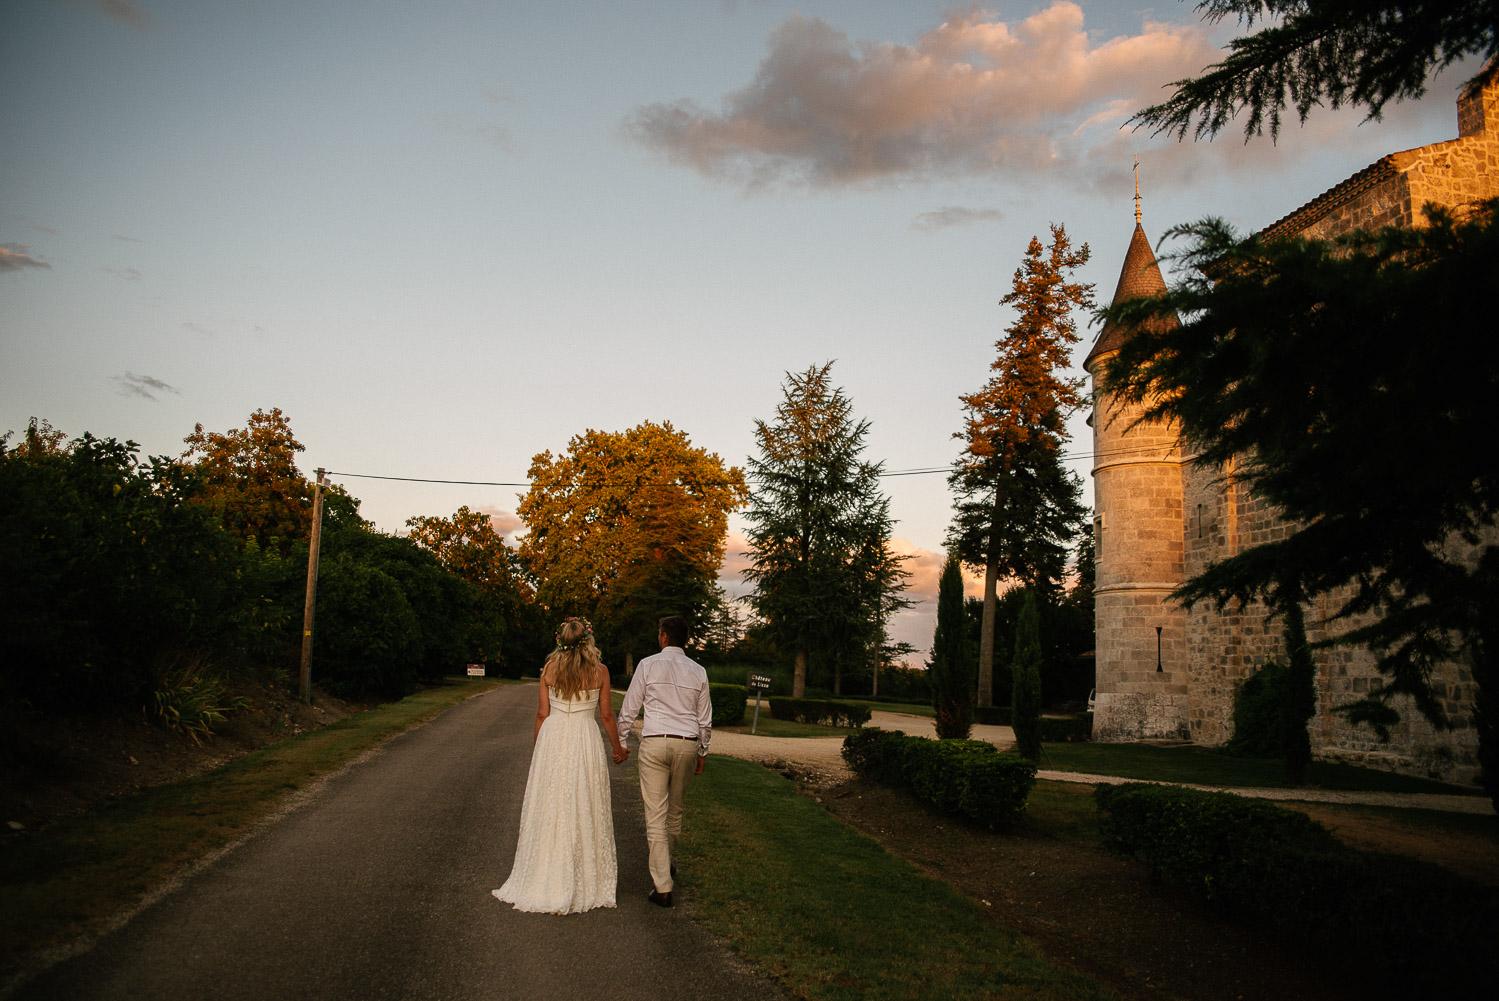 chateau_de_lisse_gers_wedding_katy_webb_photography_france_UK114